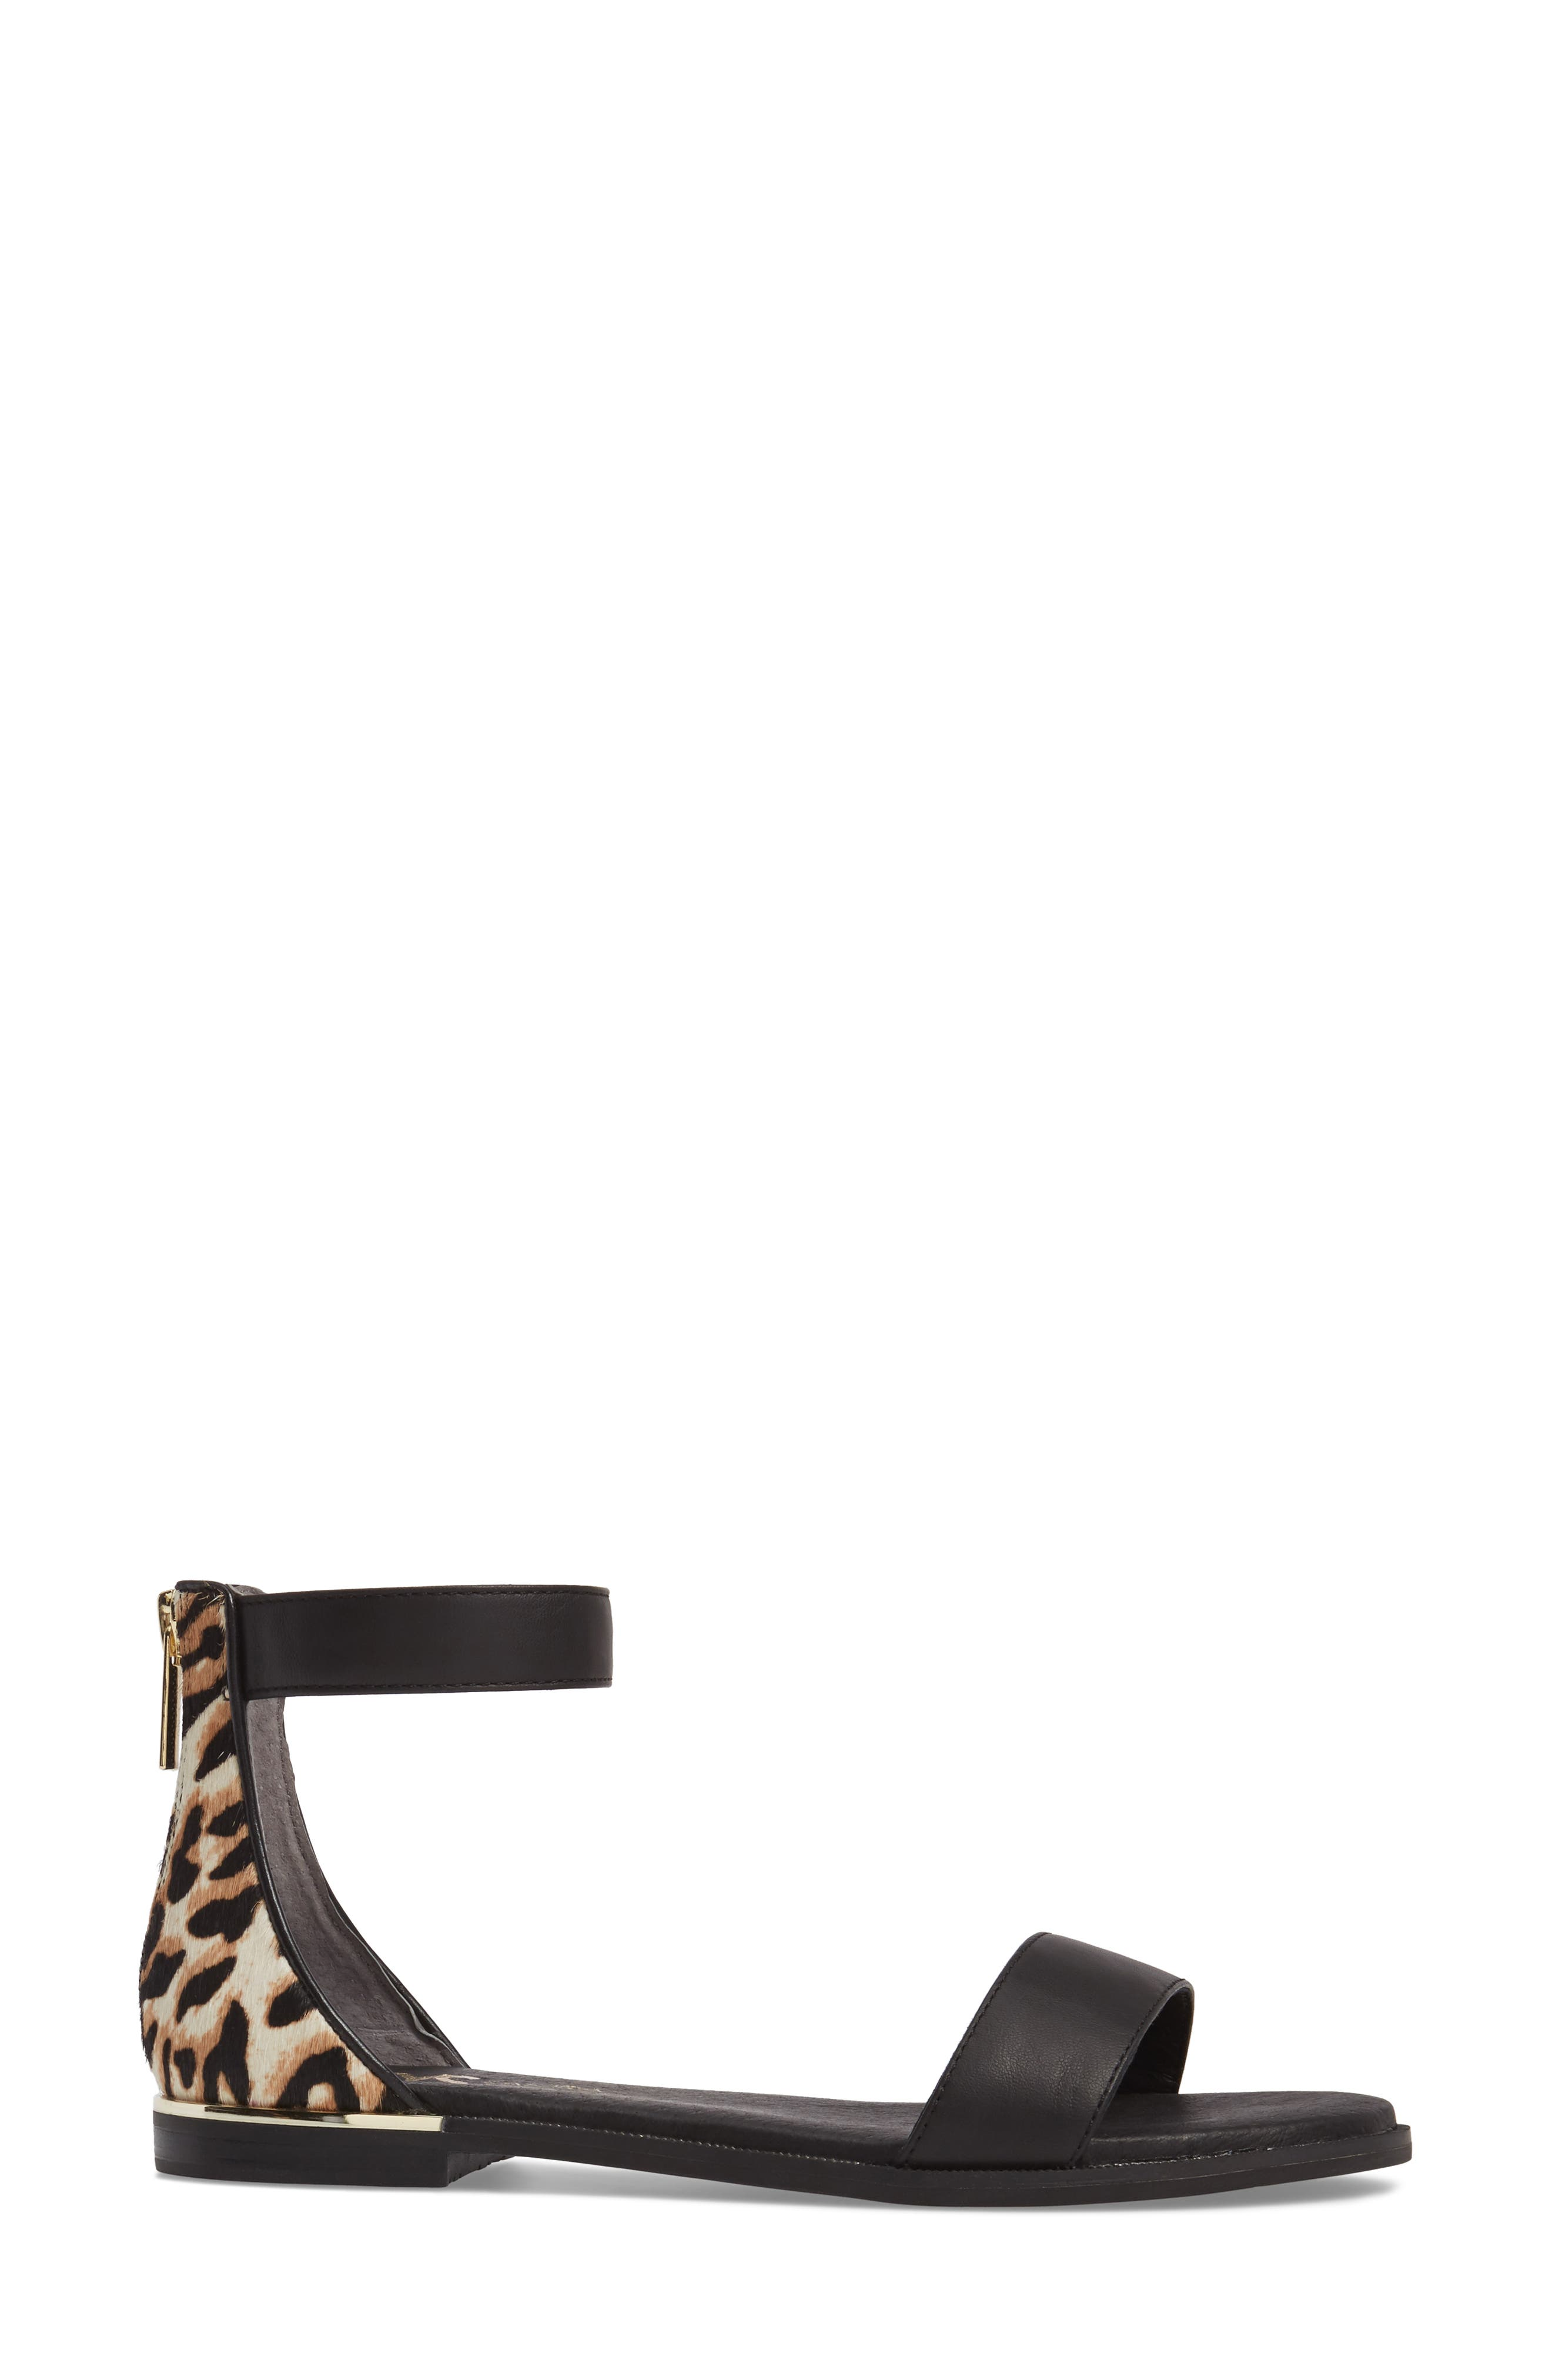 ,                             'Cambelle' Ankle Strap Sandal,                             Alternate thumbnail 25, color,                             118